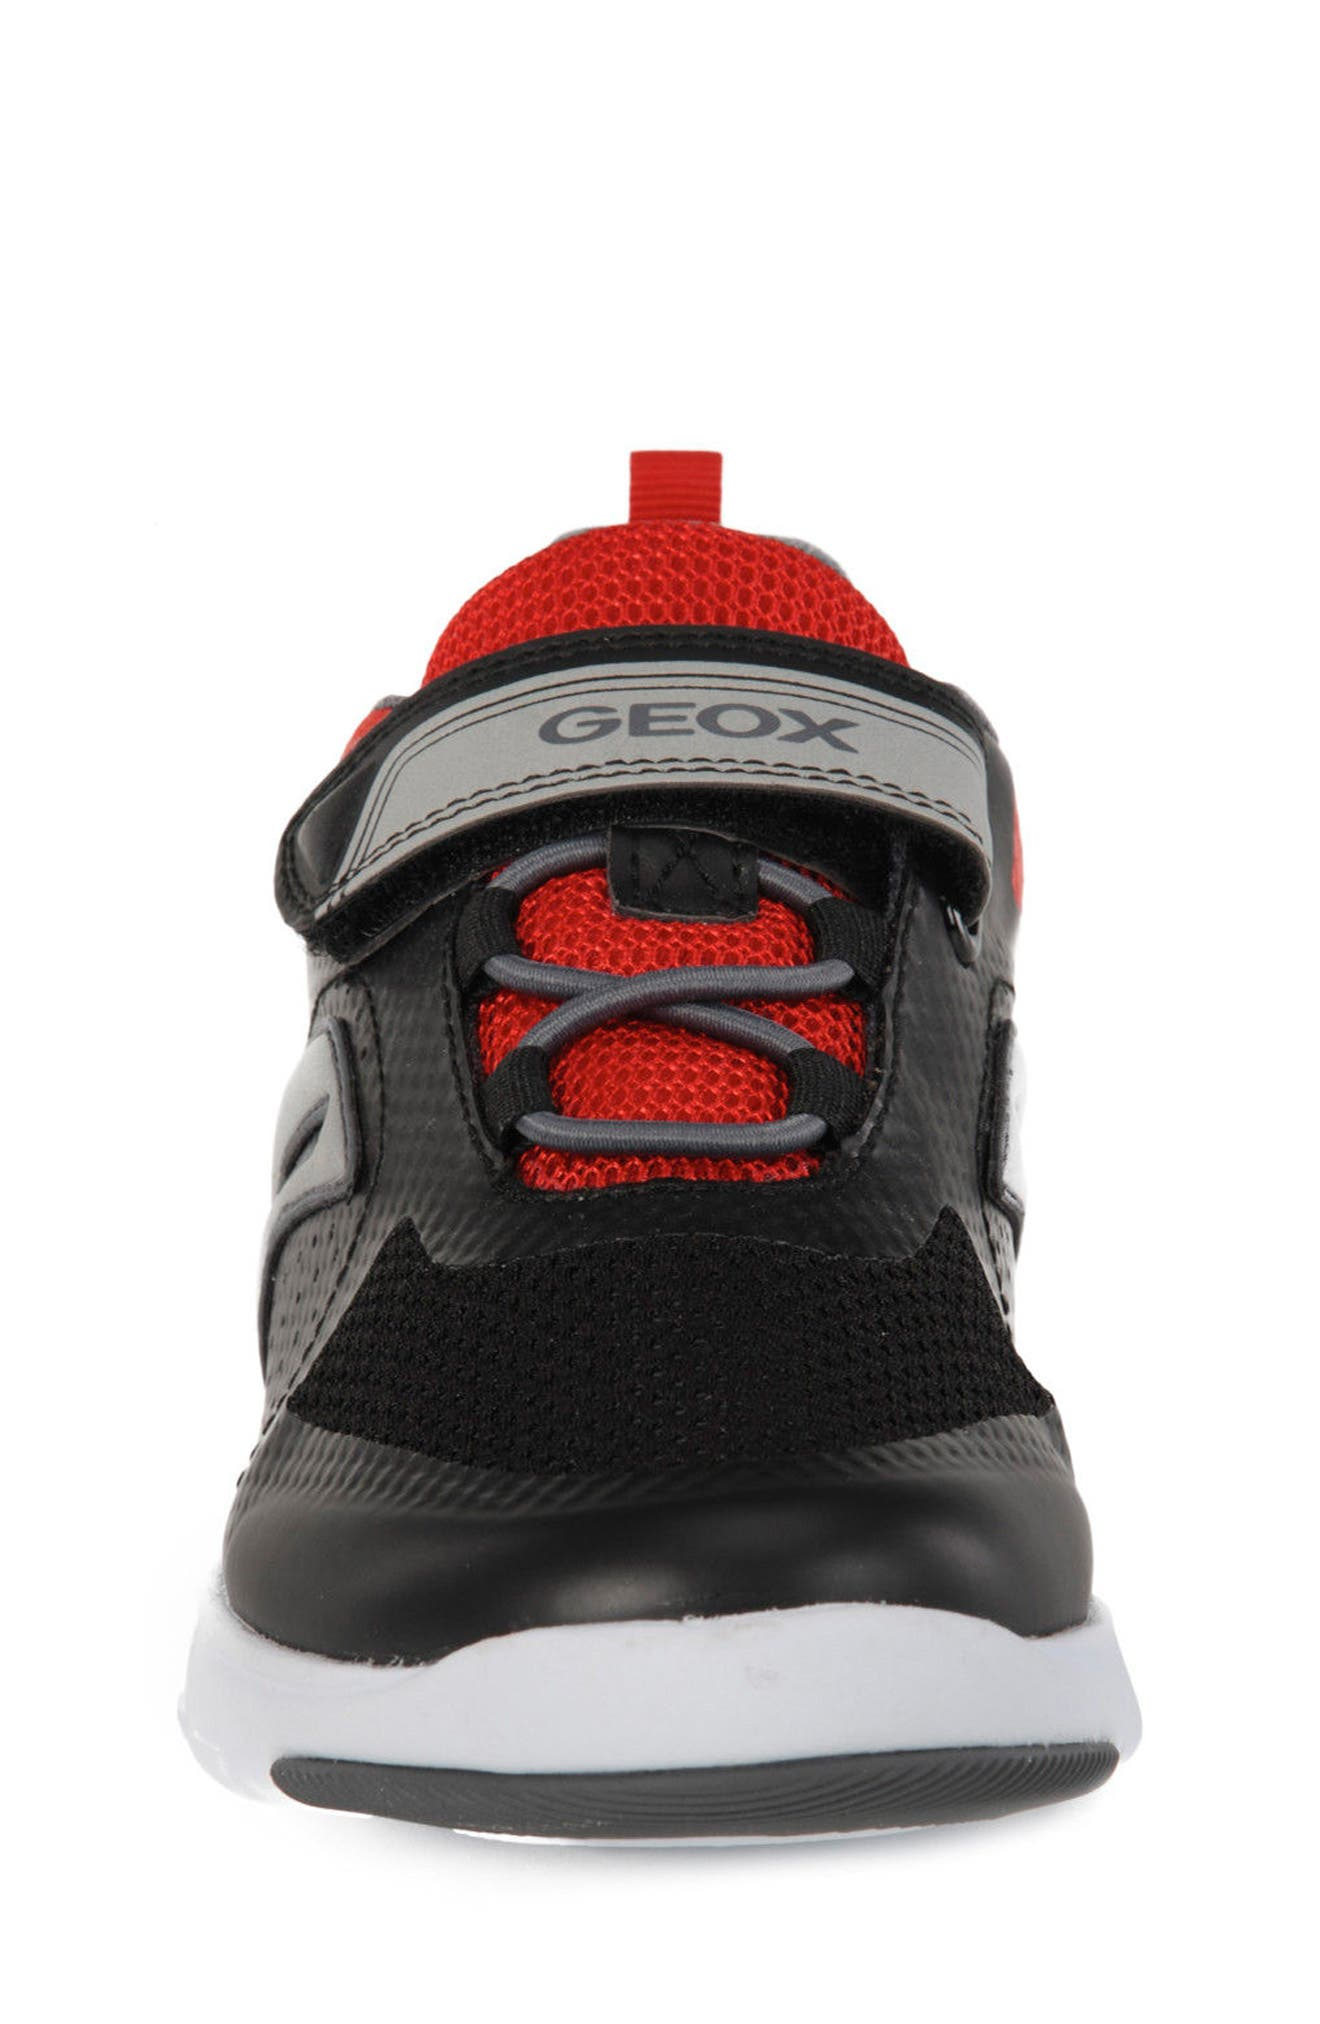 Xunday Low Top Sneaker,                             Alternate thumbnail 4, color,                             001